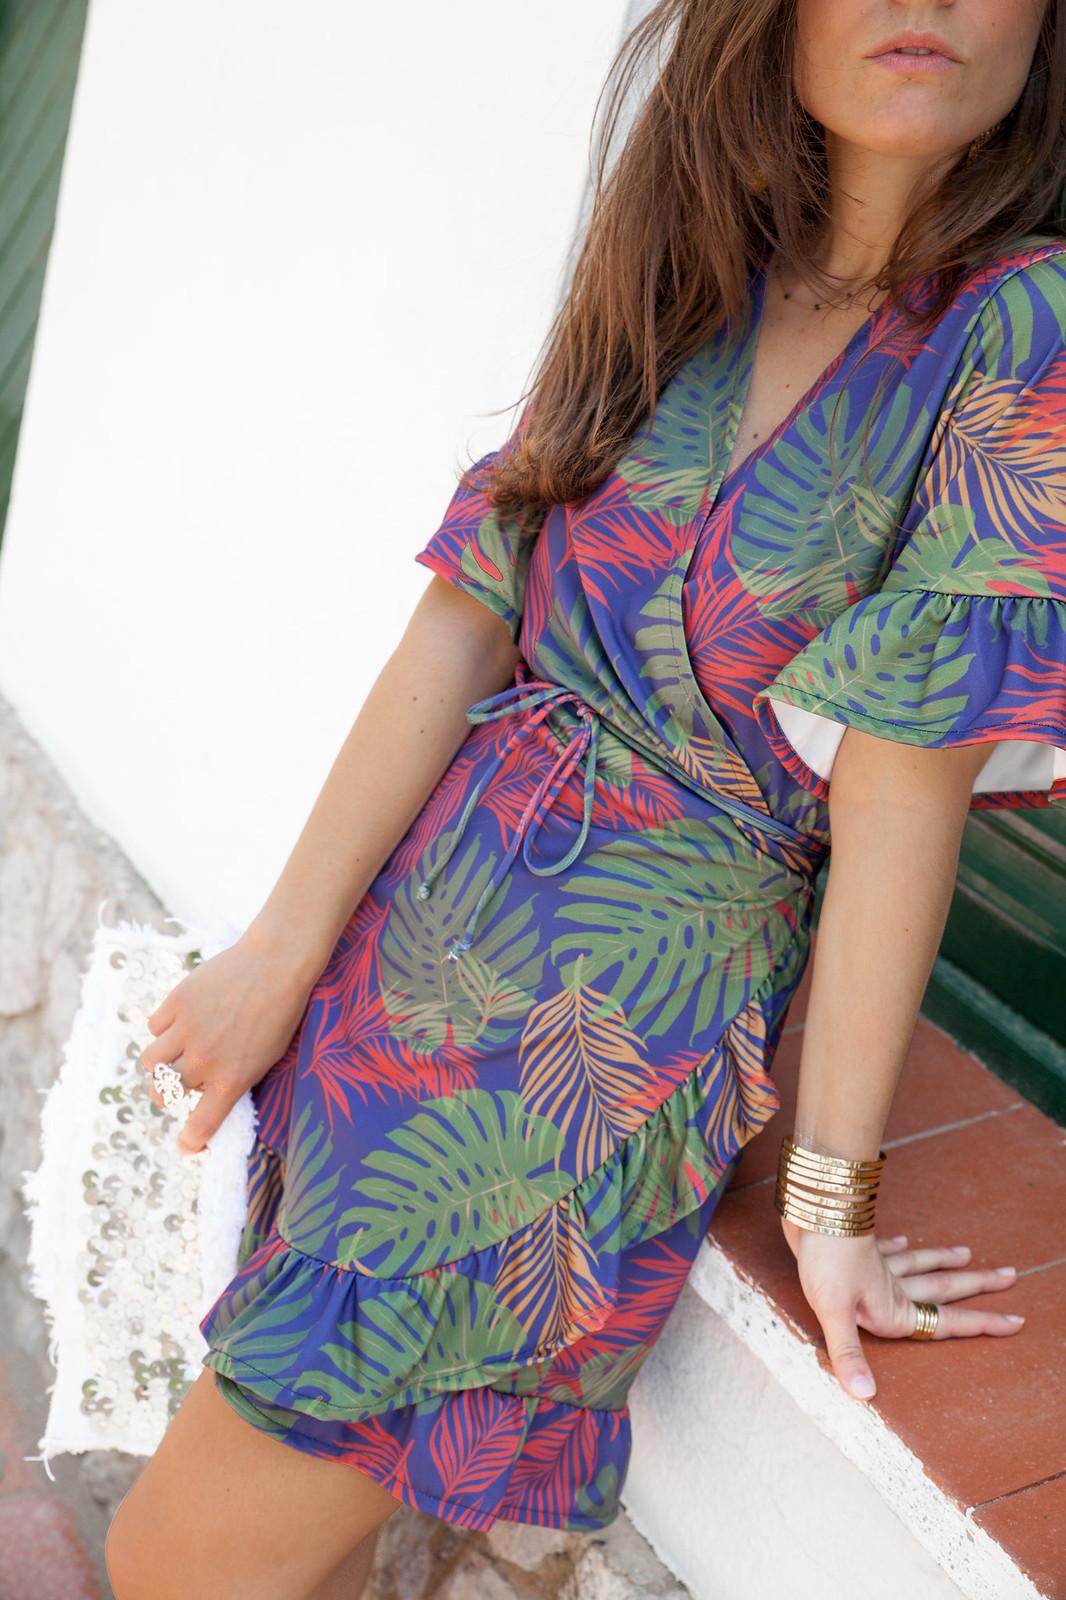 06_vestido_cruzado_estampado_rüga_theguestgirl_fashion_influencer_barcelona